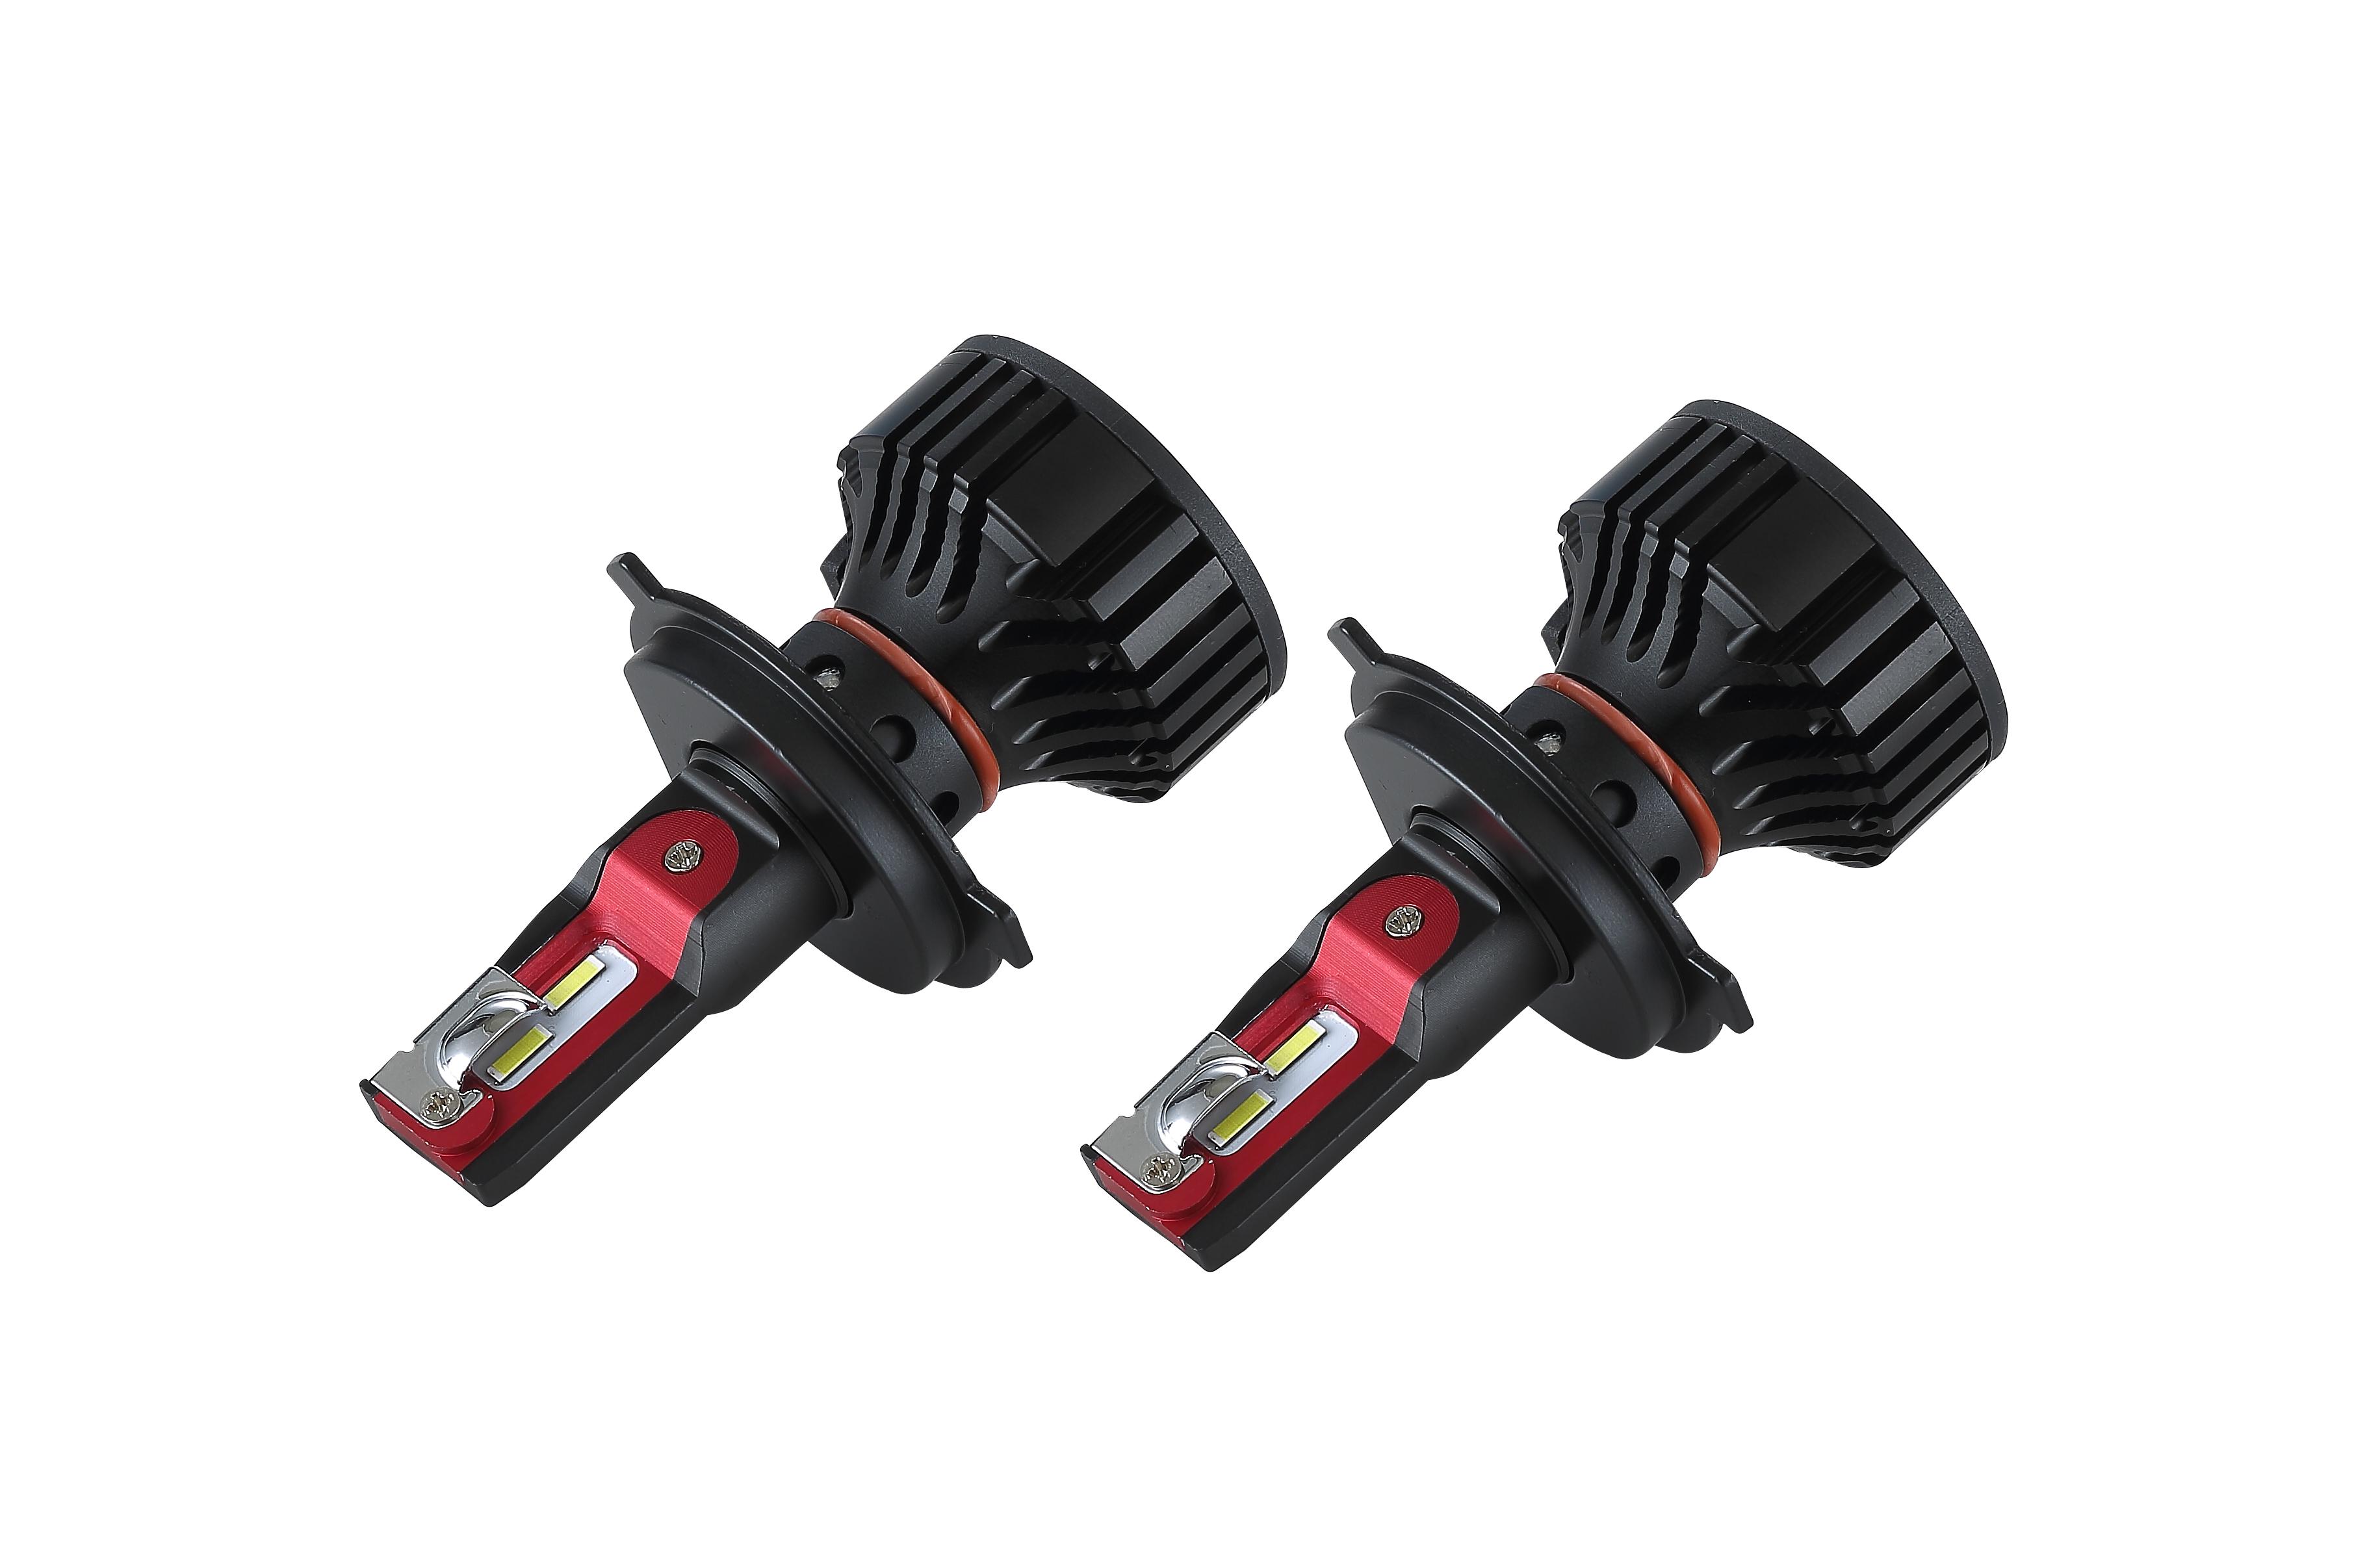 F2 led headlight